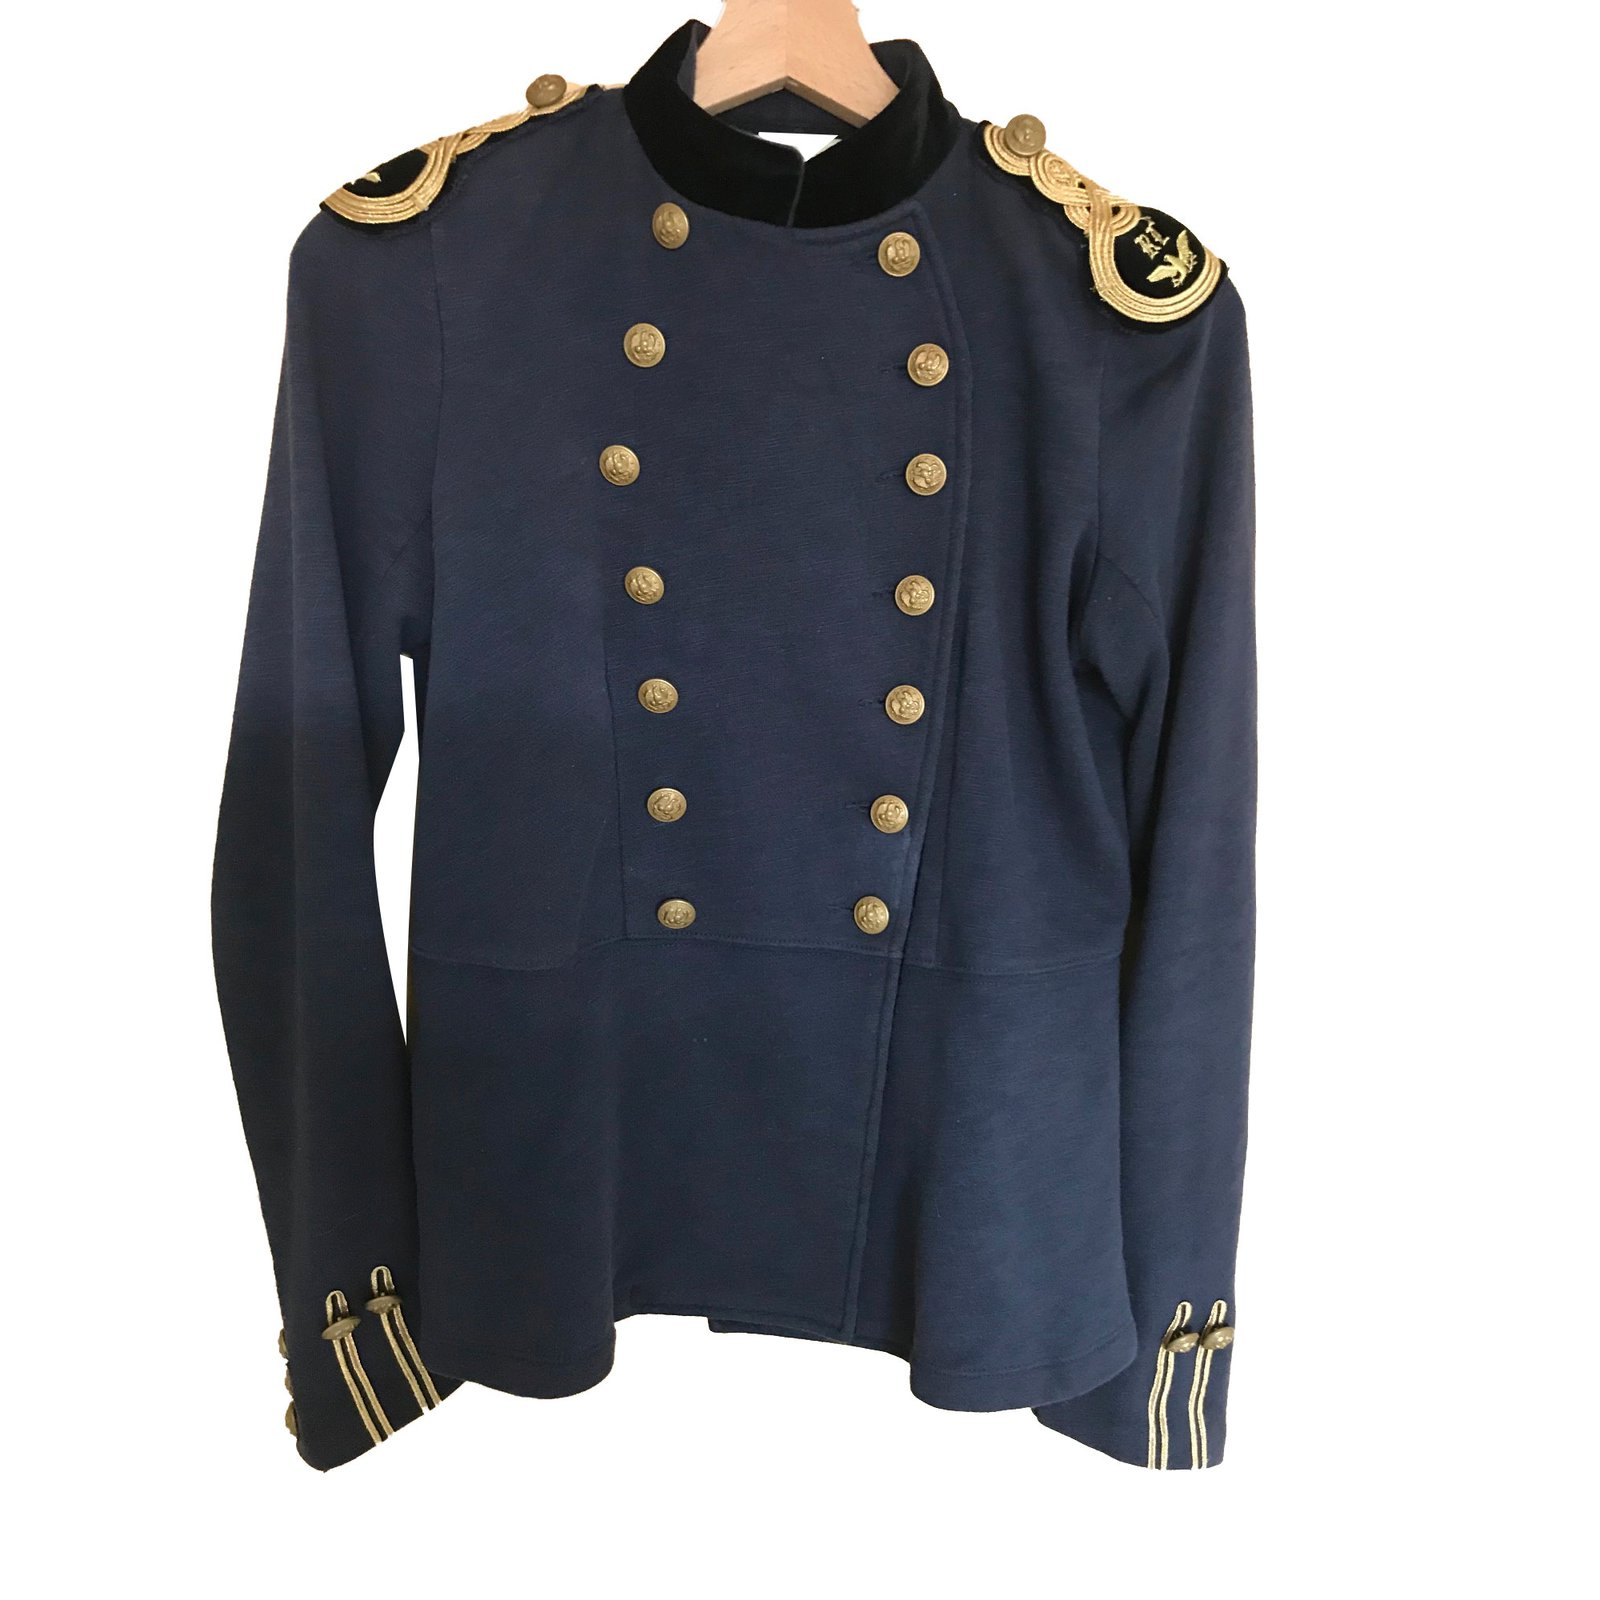 Vestes Ralph Lauren Ref Marine Joli Bleu Coton 64950 Polo qrwp6q